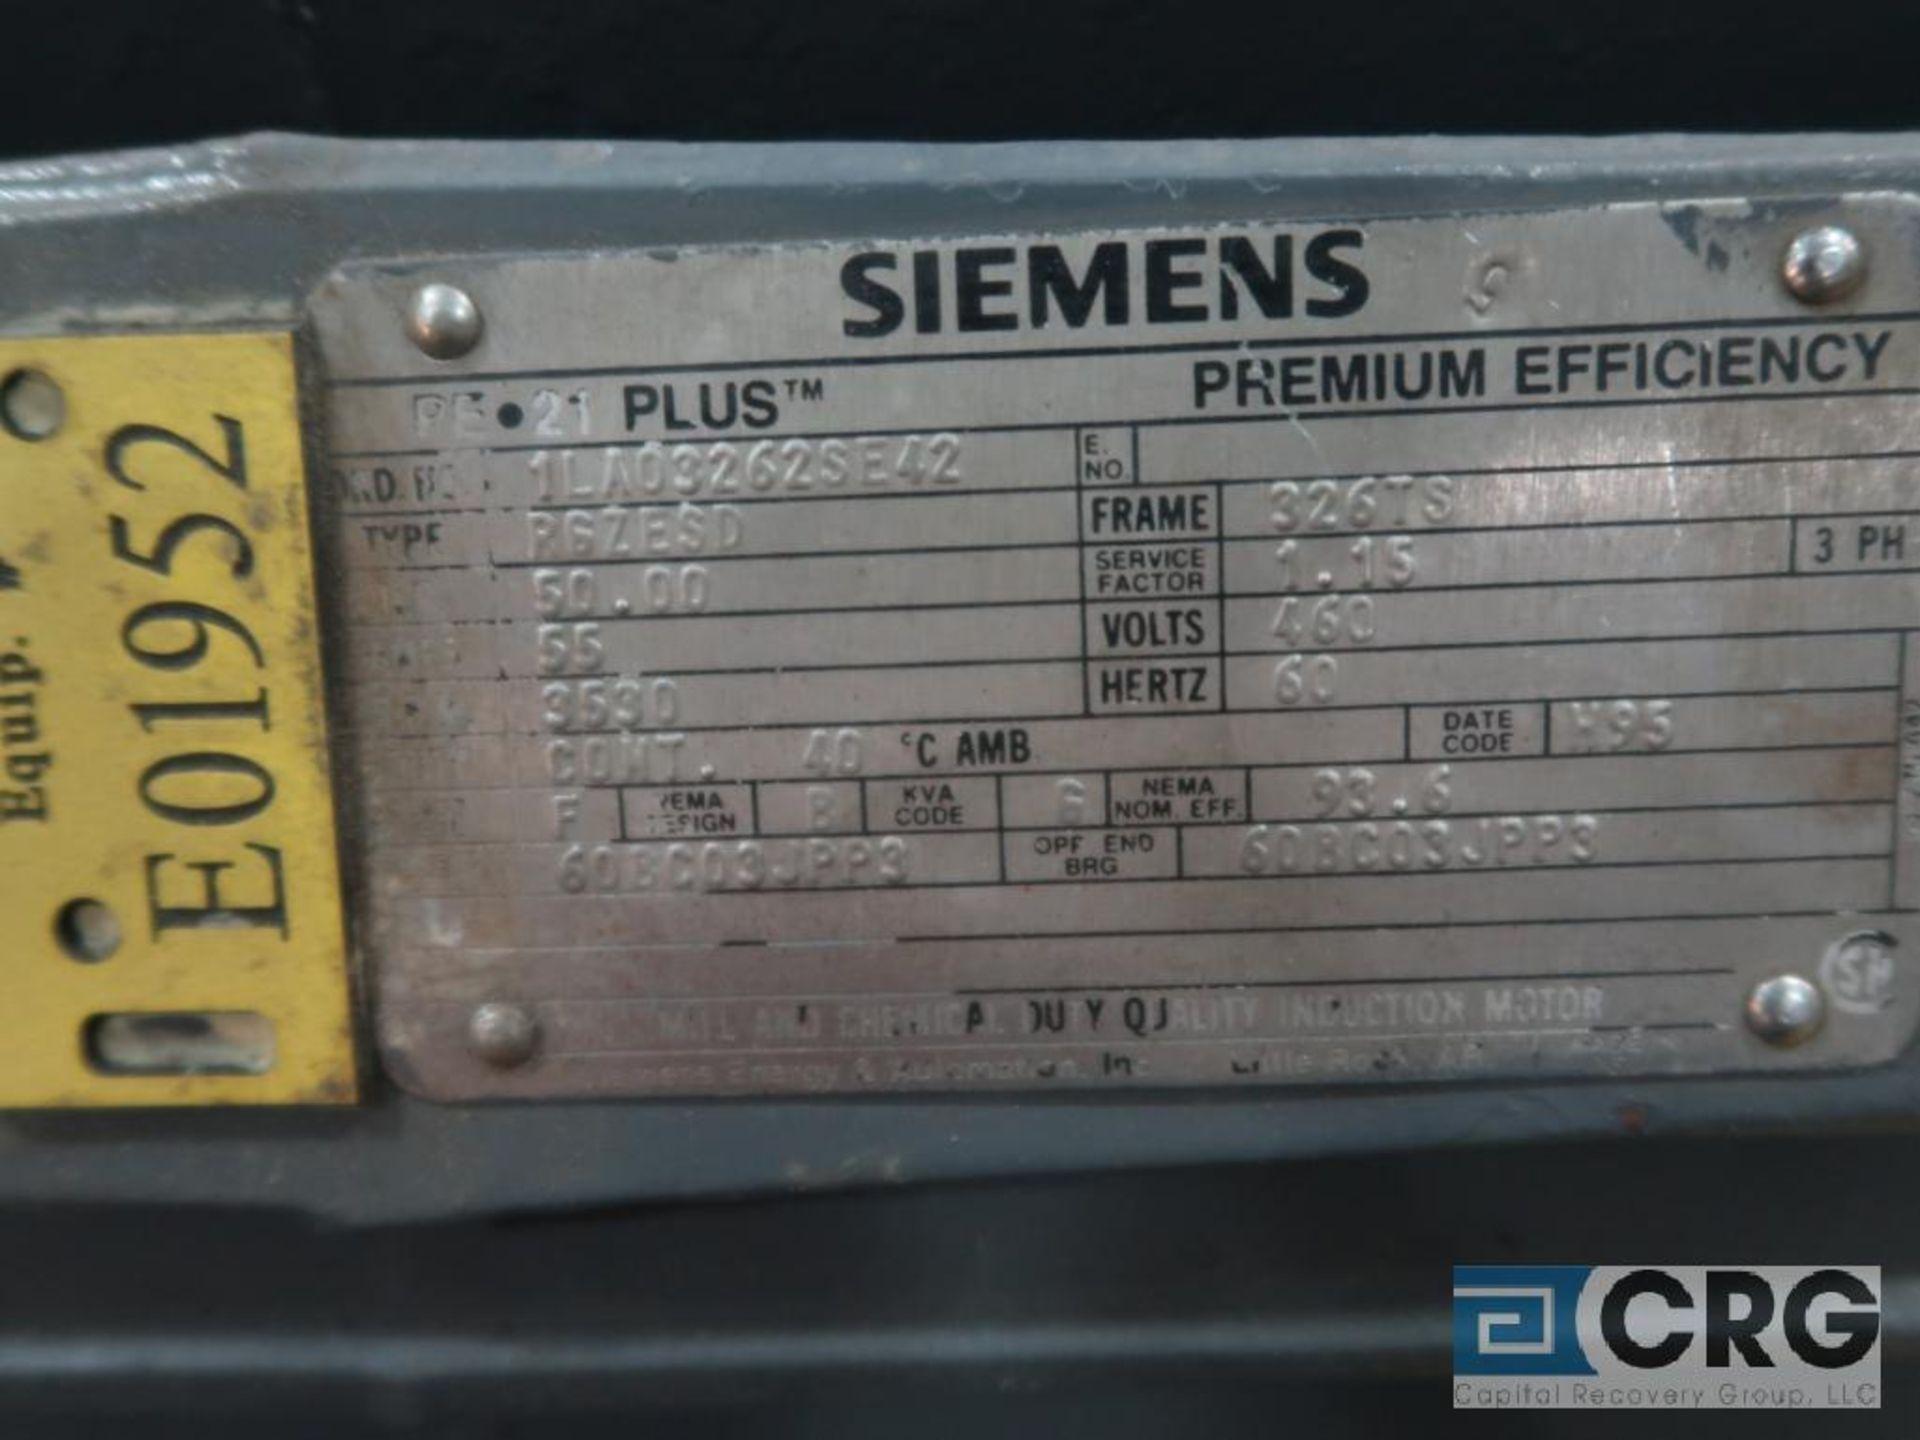 Siemens PE-21 PLUS motor, 50 HP, 3,530 RPMs, 460 volt, 3 ph., 326TS frame (Finish Building) - Image 2 of 2